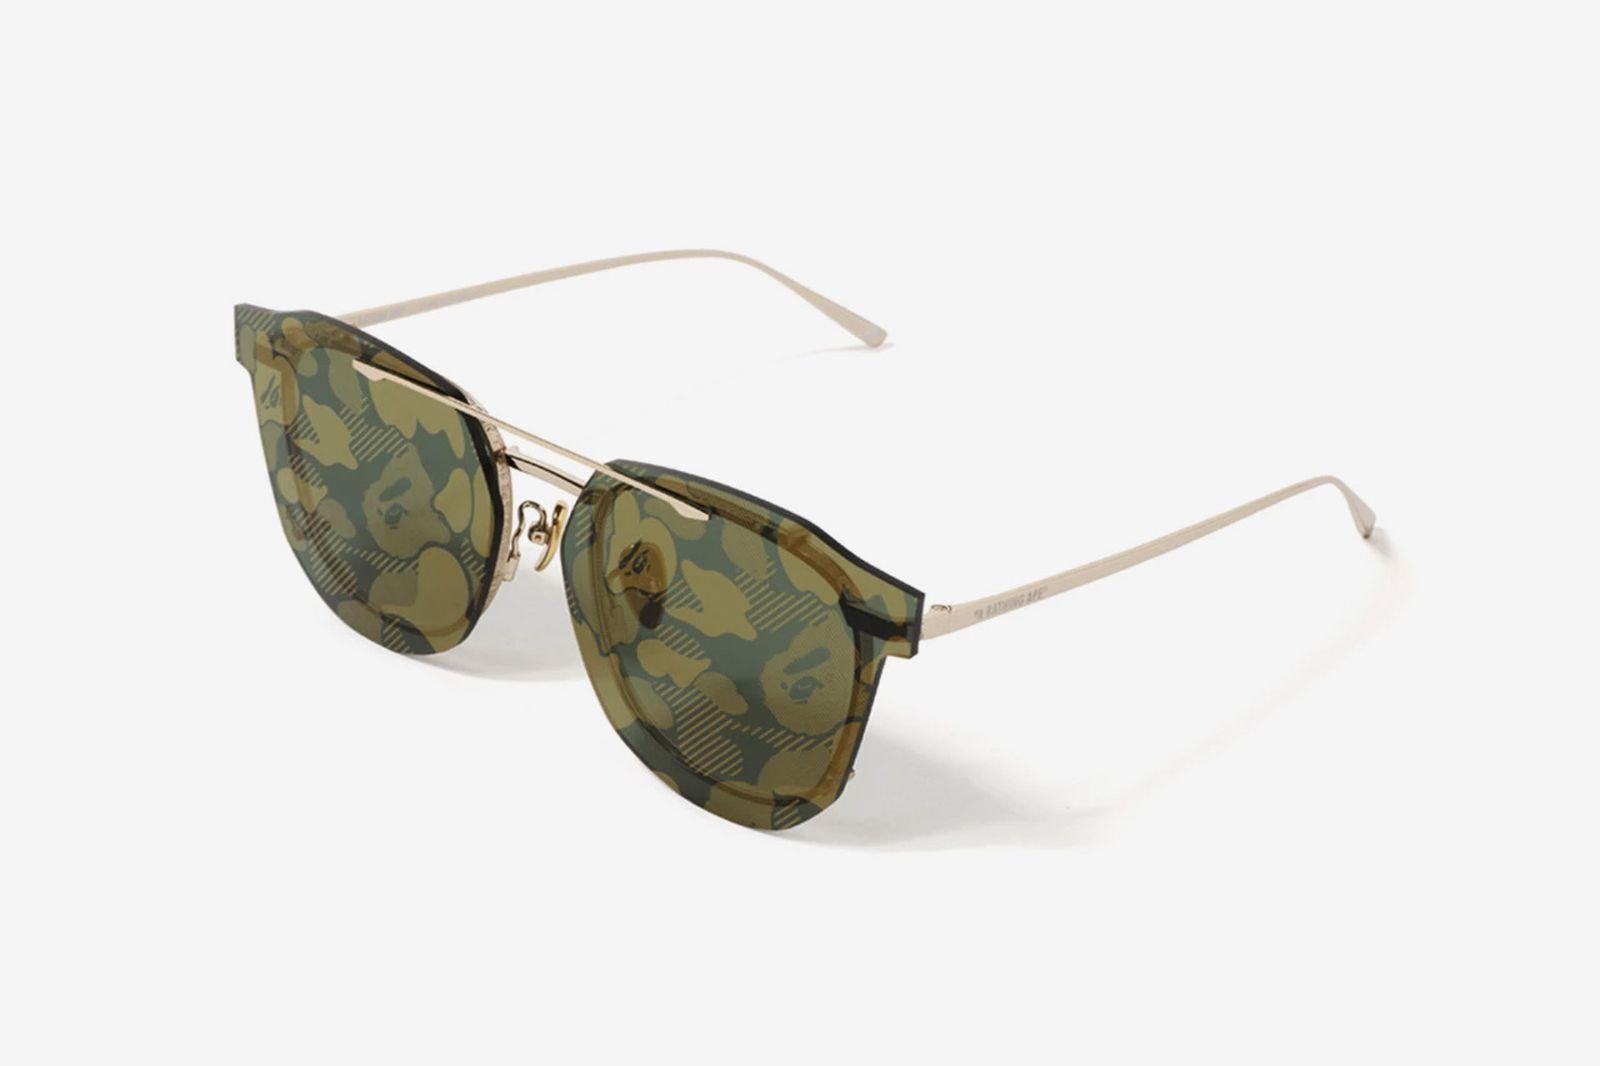 bape camo sunglasses 2019 A Bathing Ape